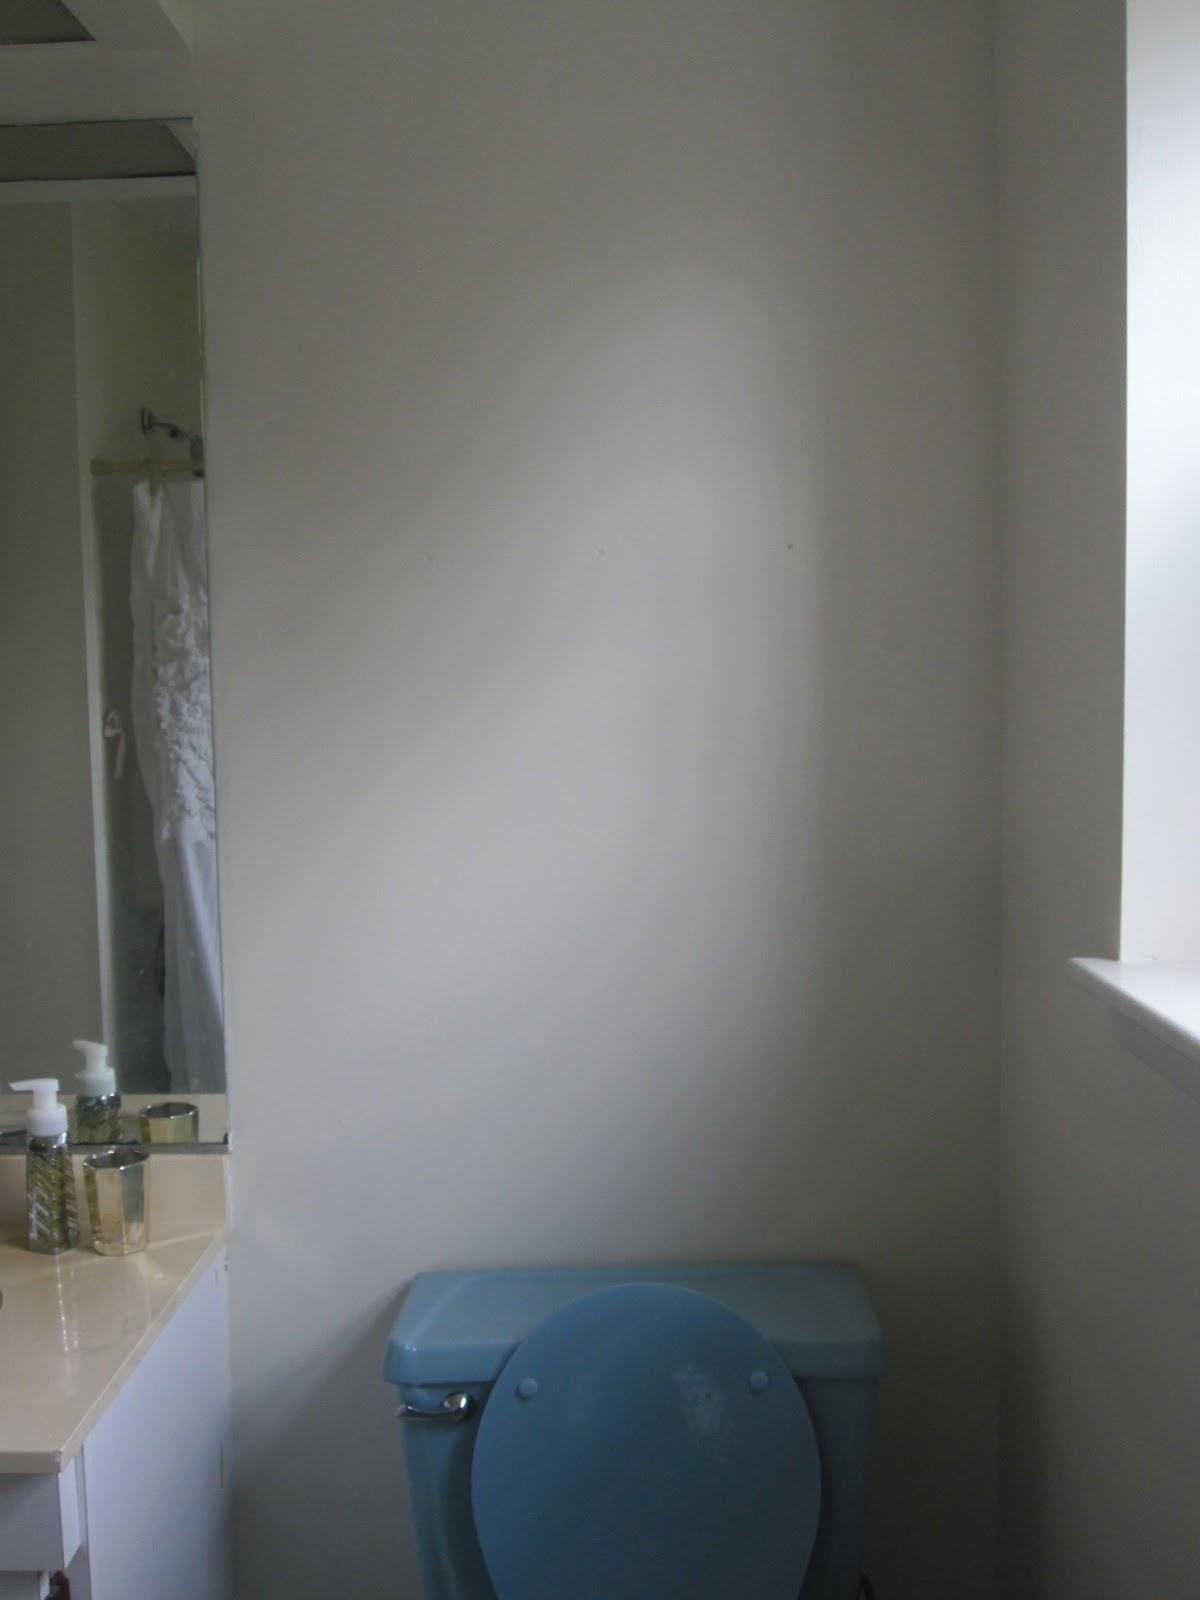 Sar and kels kelsey bathroom redo for Bathroom noise cancellation